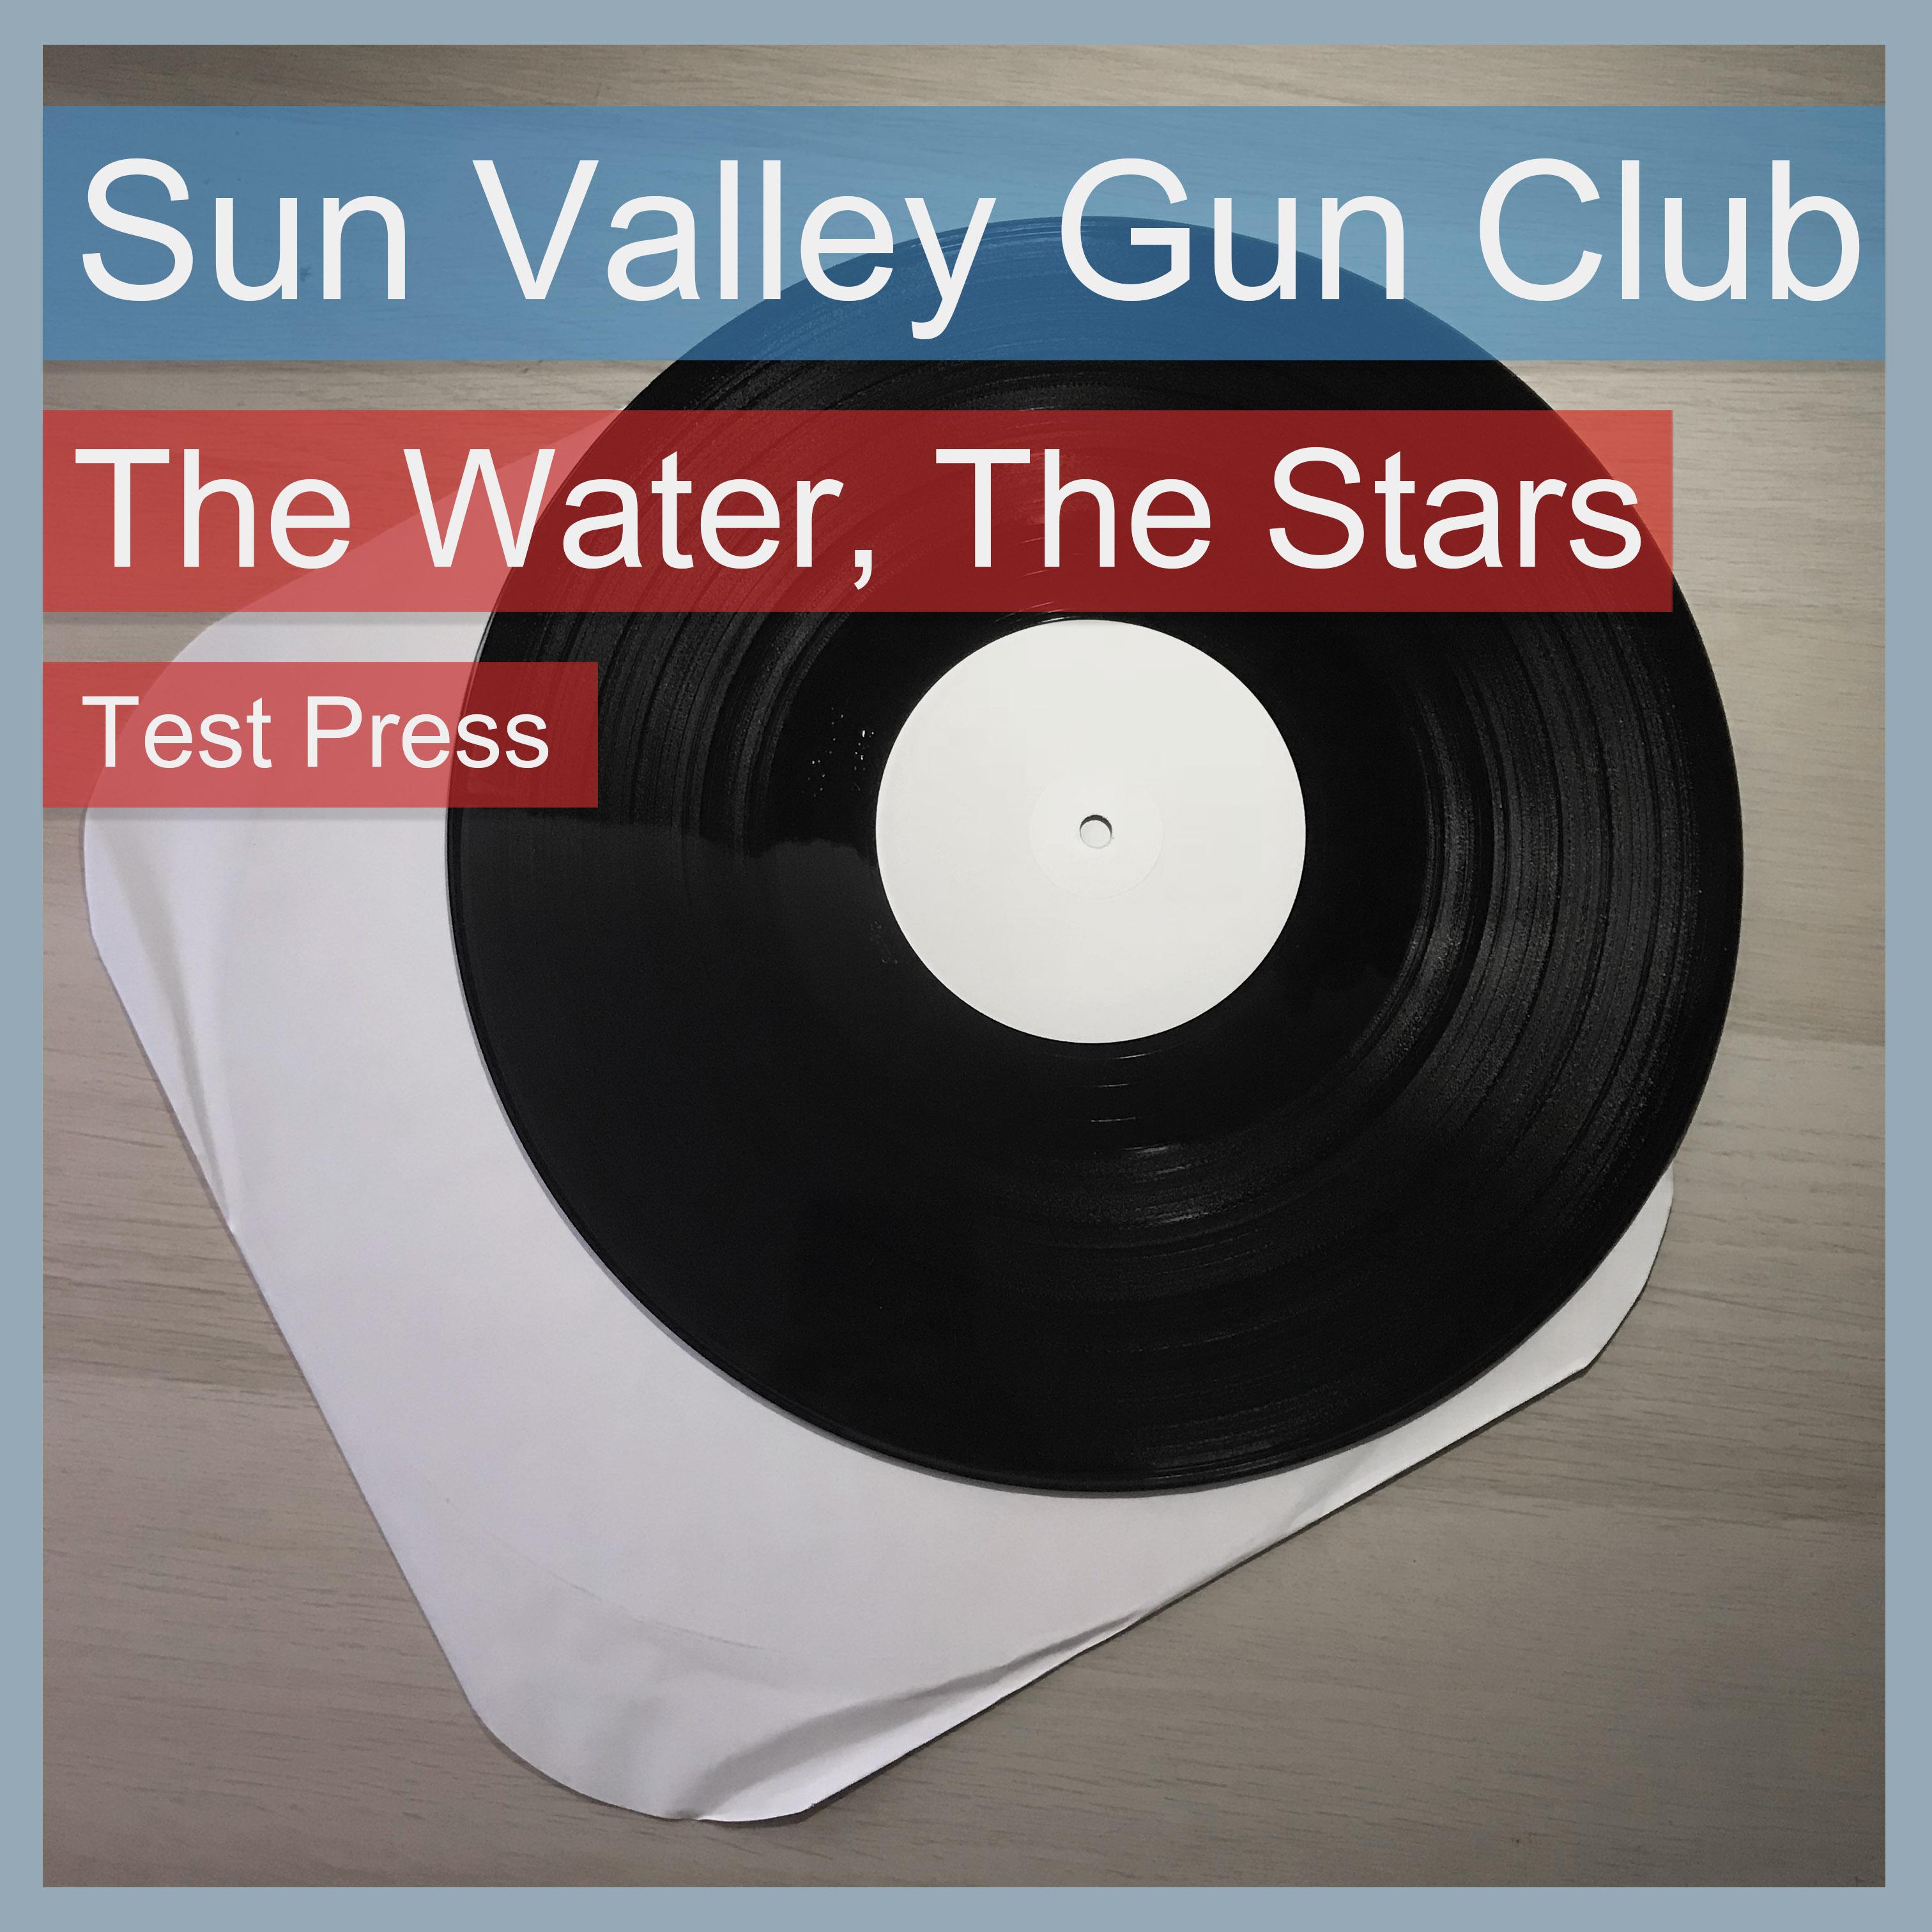 Sun Valley Gun Club